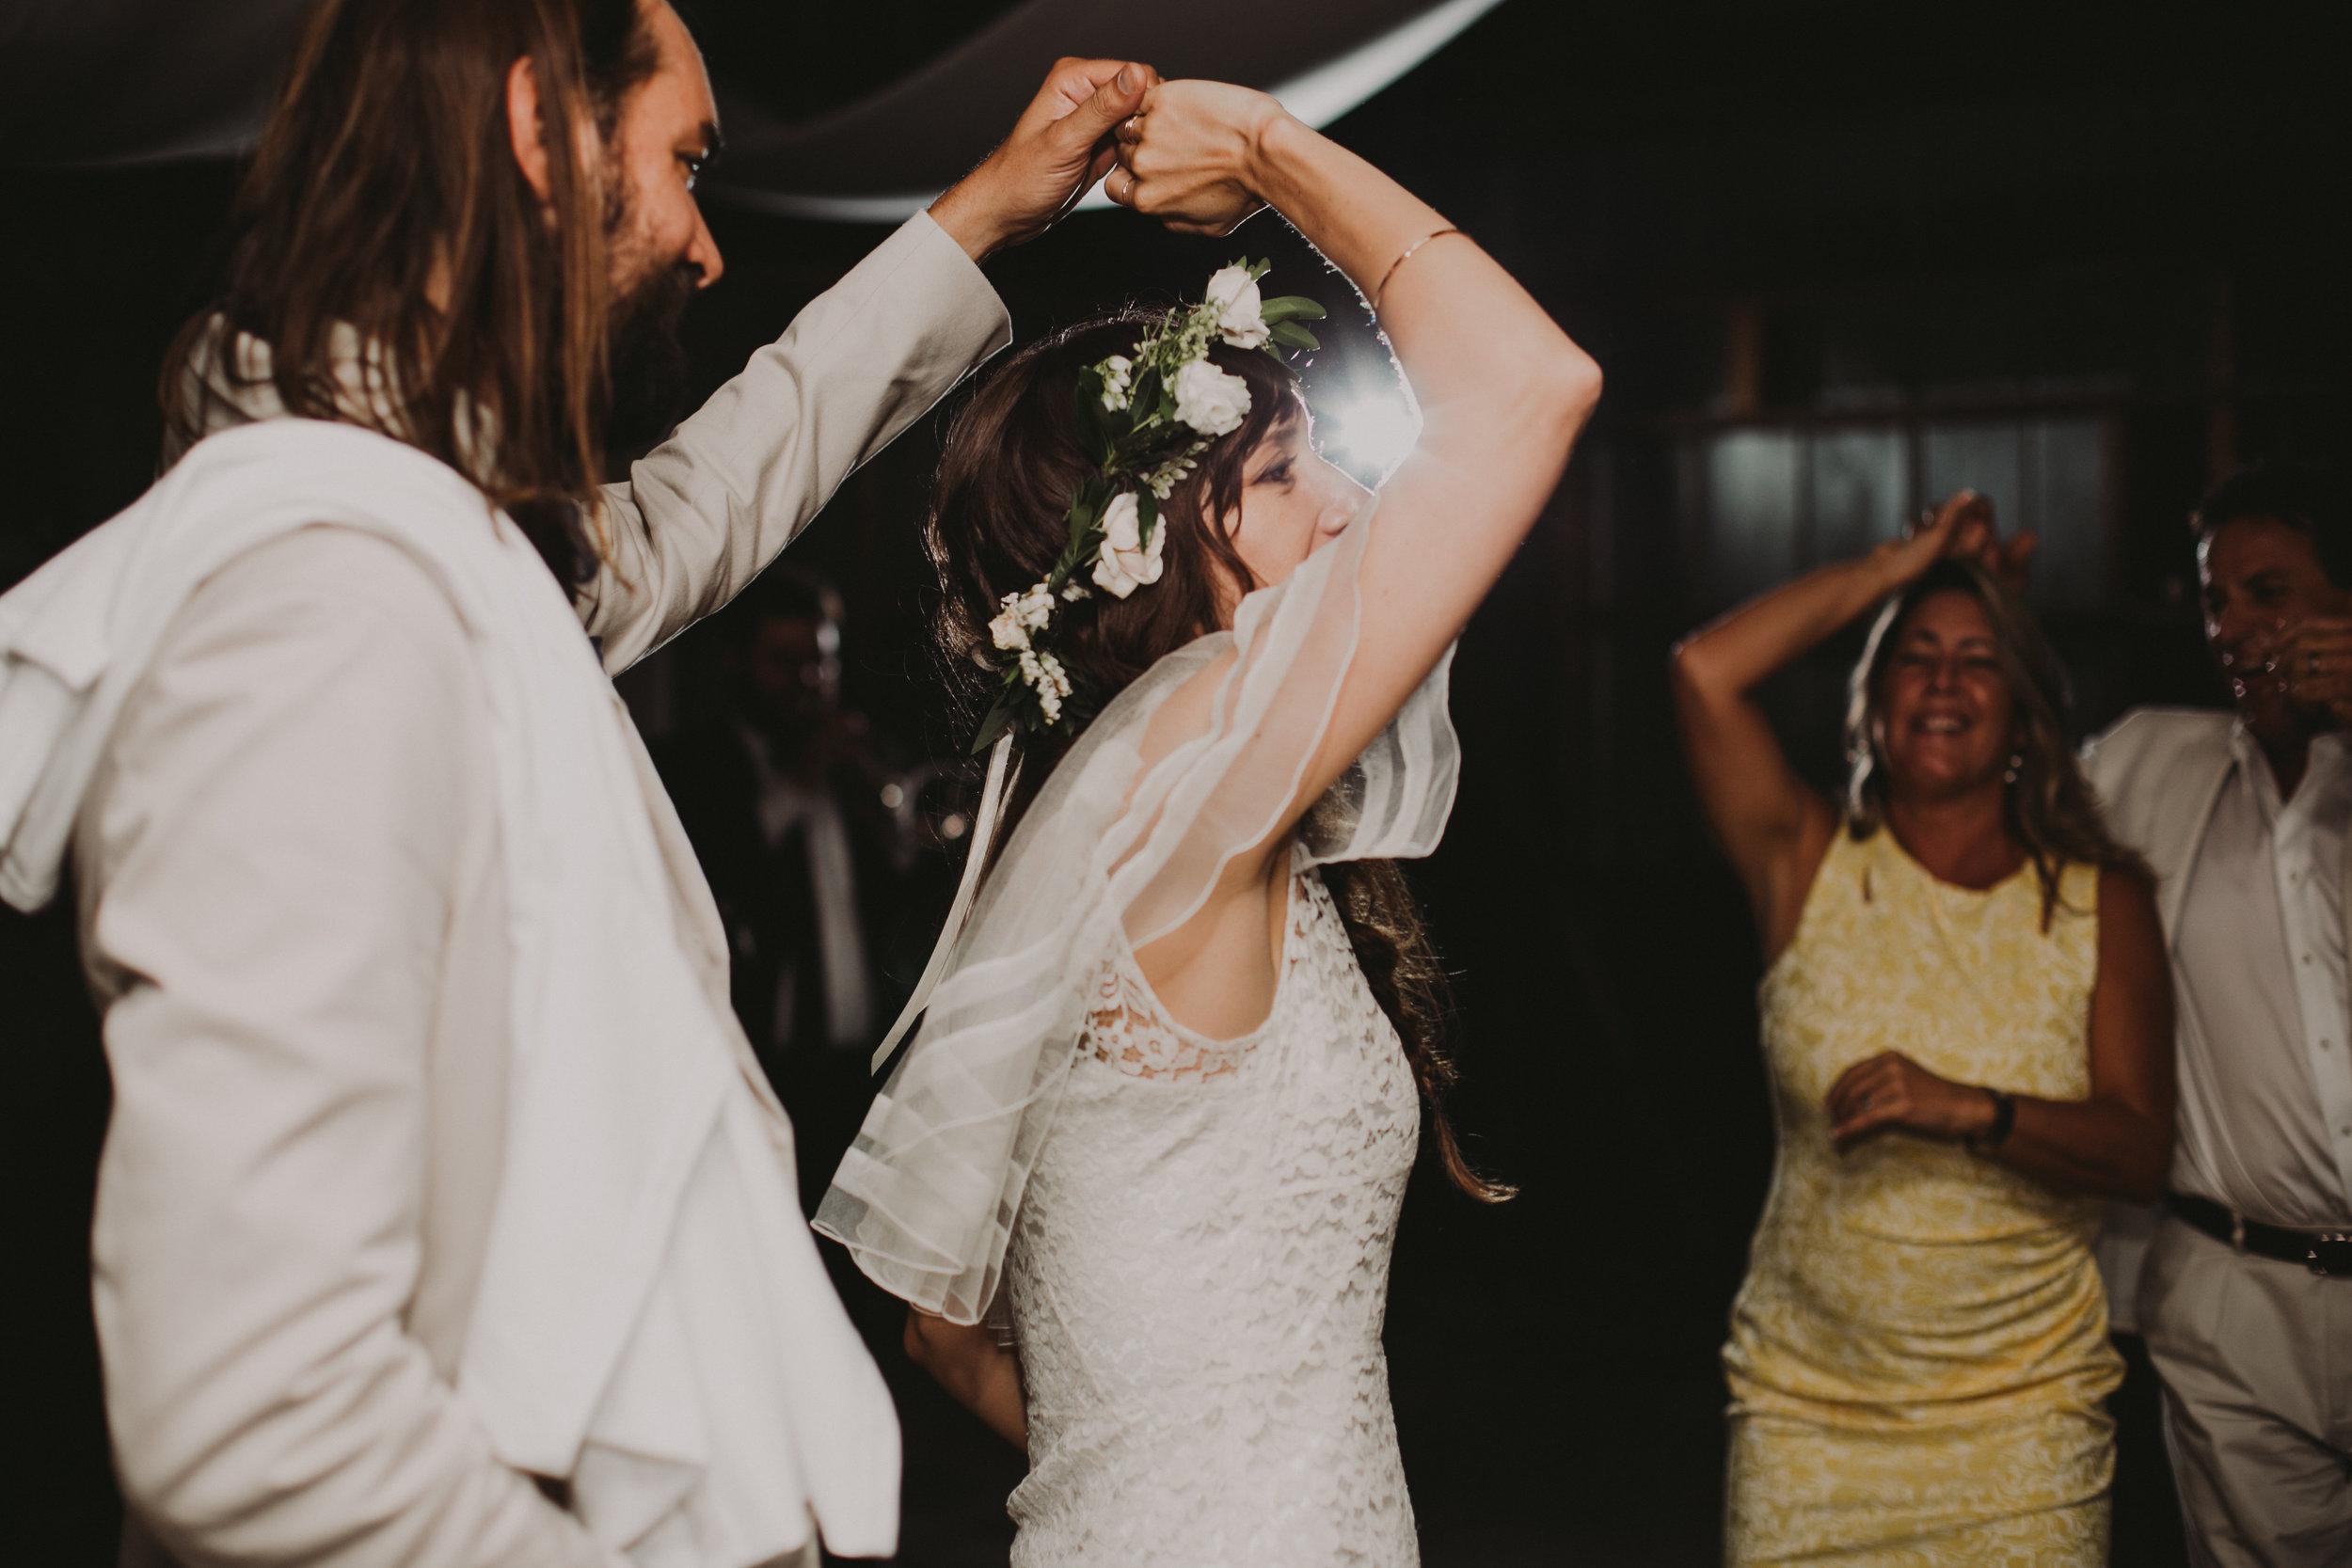 LIBERTY_VIEW_FARM_HIGHLAND_NY_WEDDING_CHELLISE_MICHAEL_PHOTOGRAPHY888.JPG